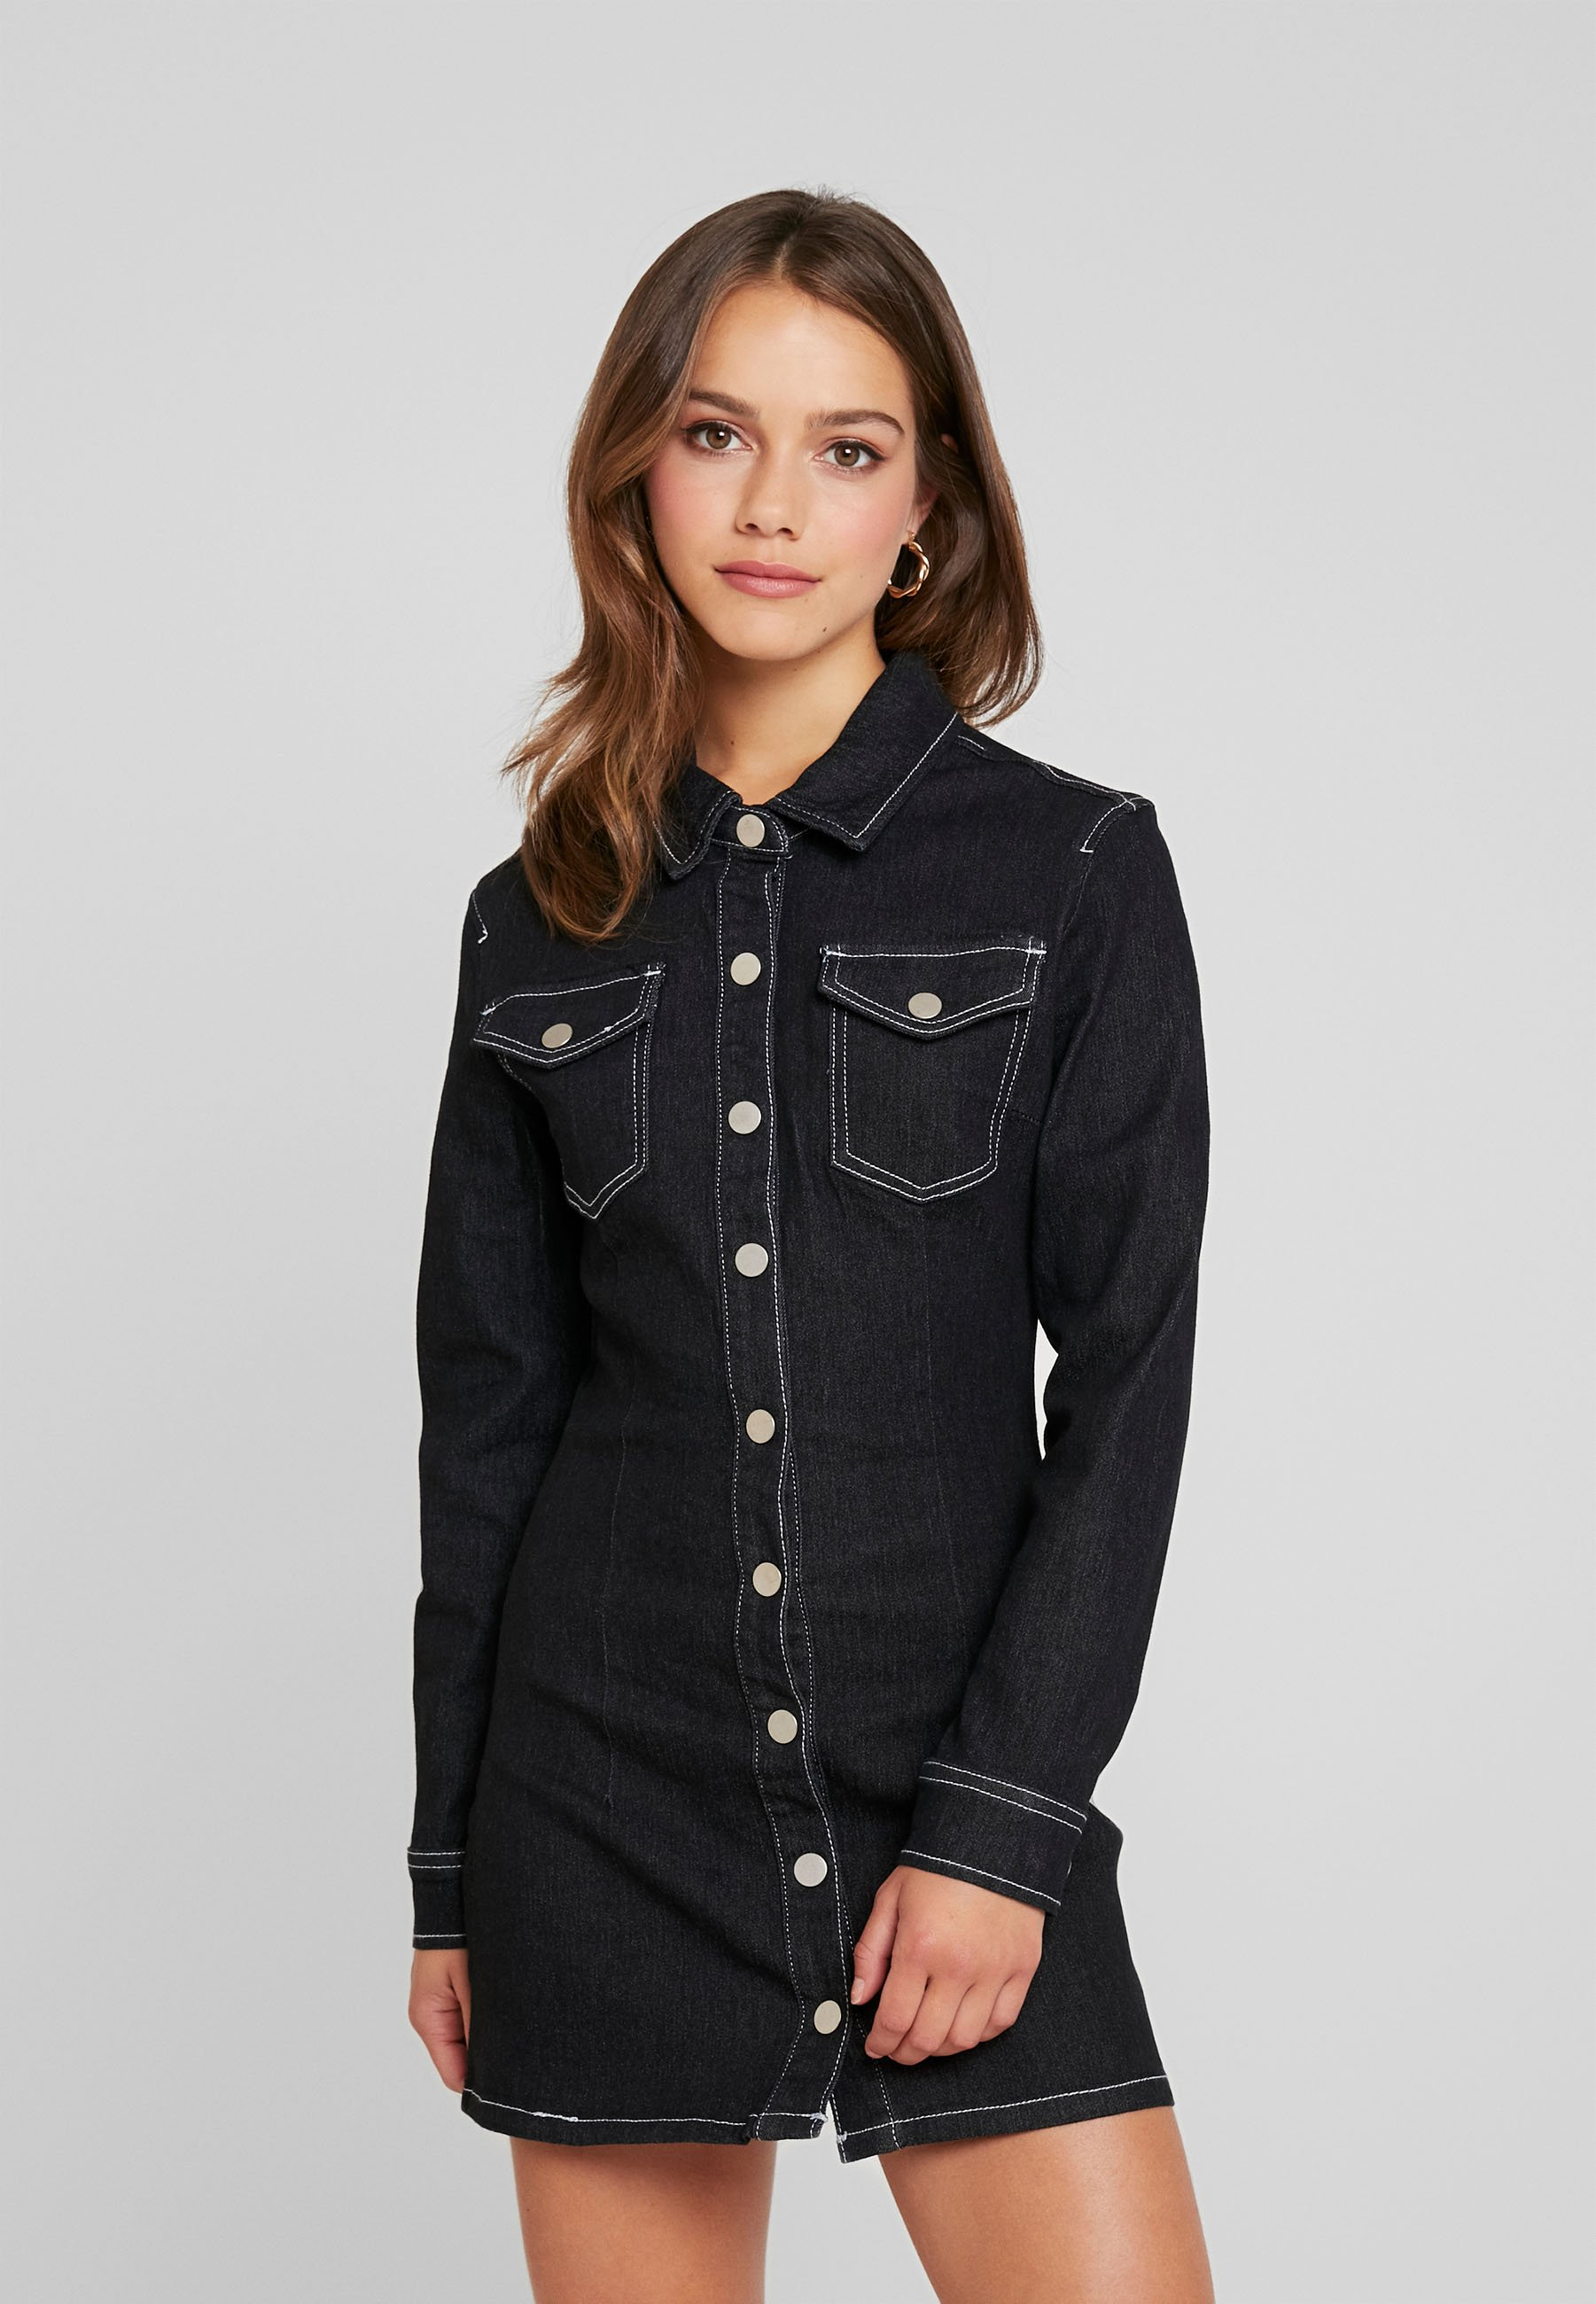 Button Petite Missguided Sleeve Fitted Long Jersey Black Through DressRobe En 54qRjLA3